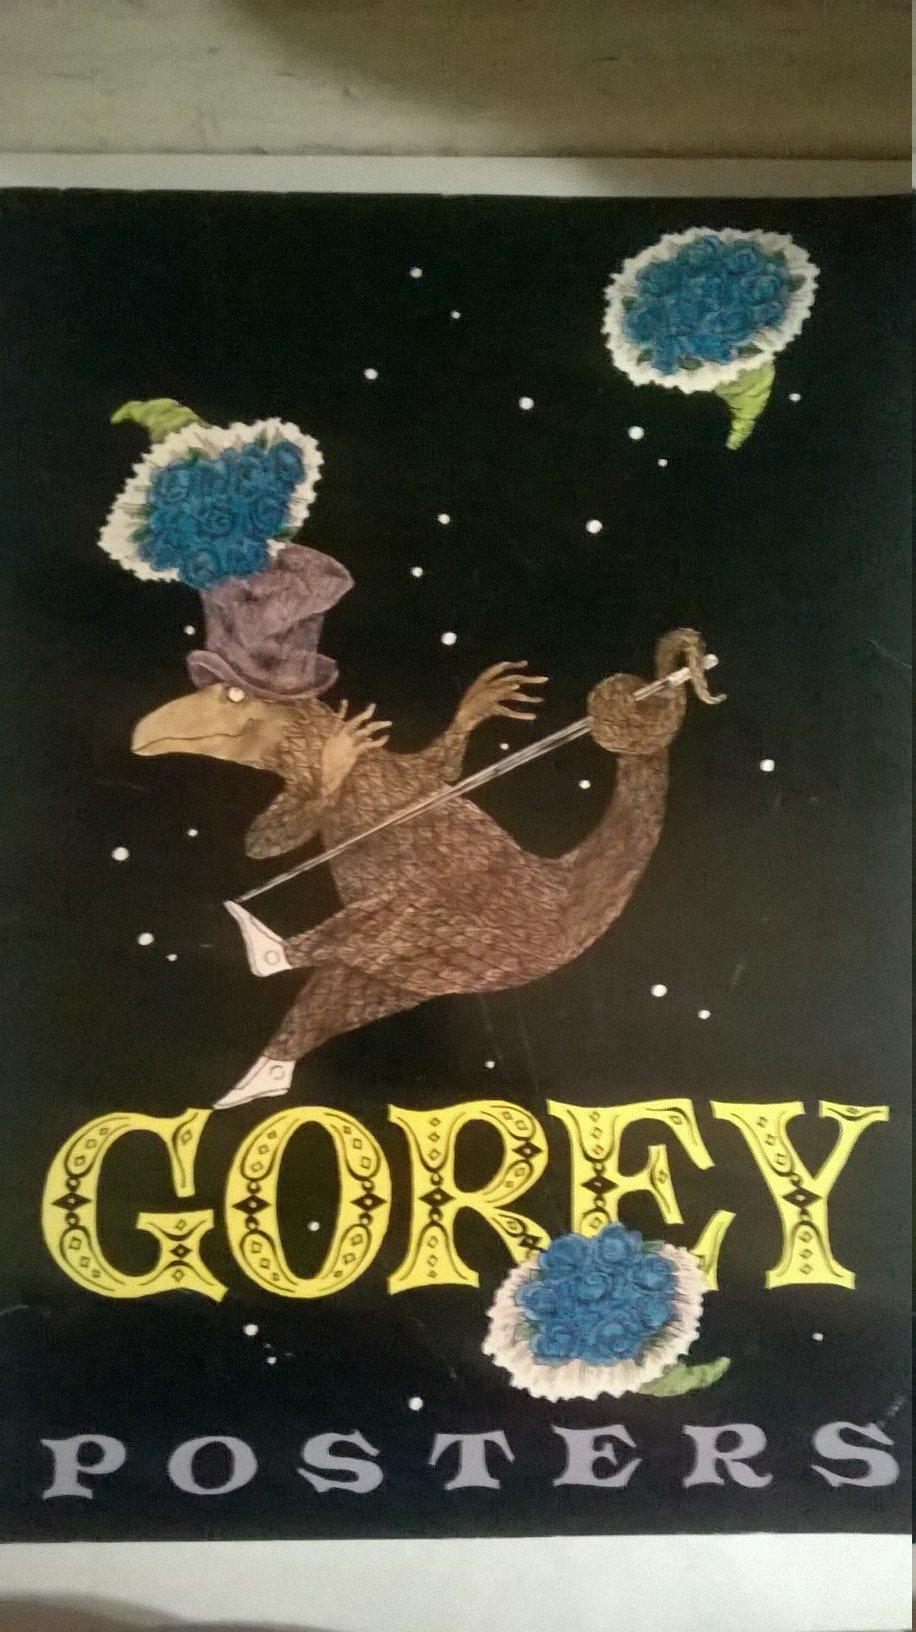 Posters: Amazon.es: Edward Gorey: Libros en idiomas extranjeros